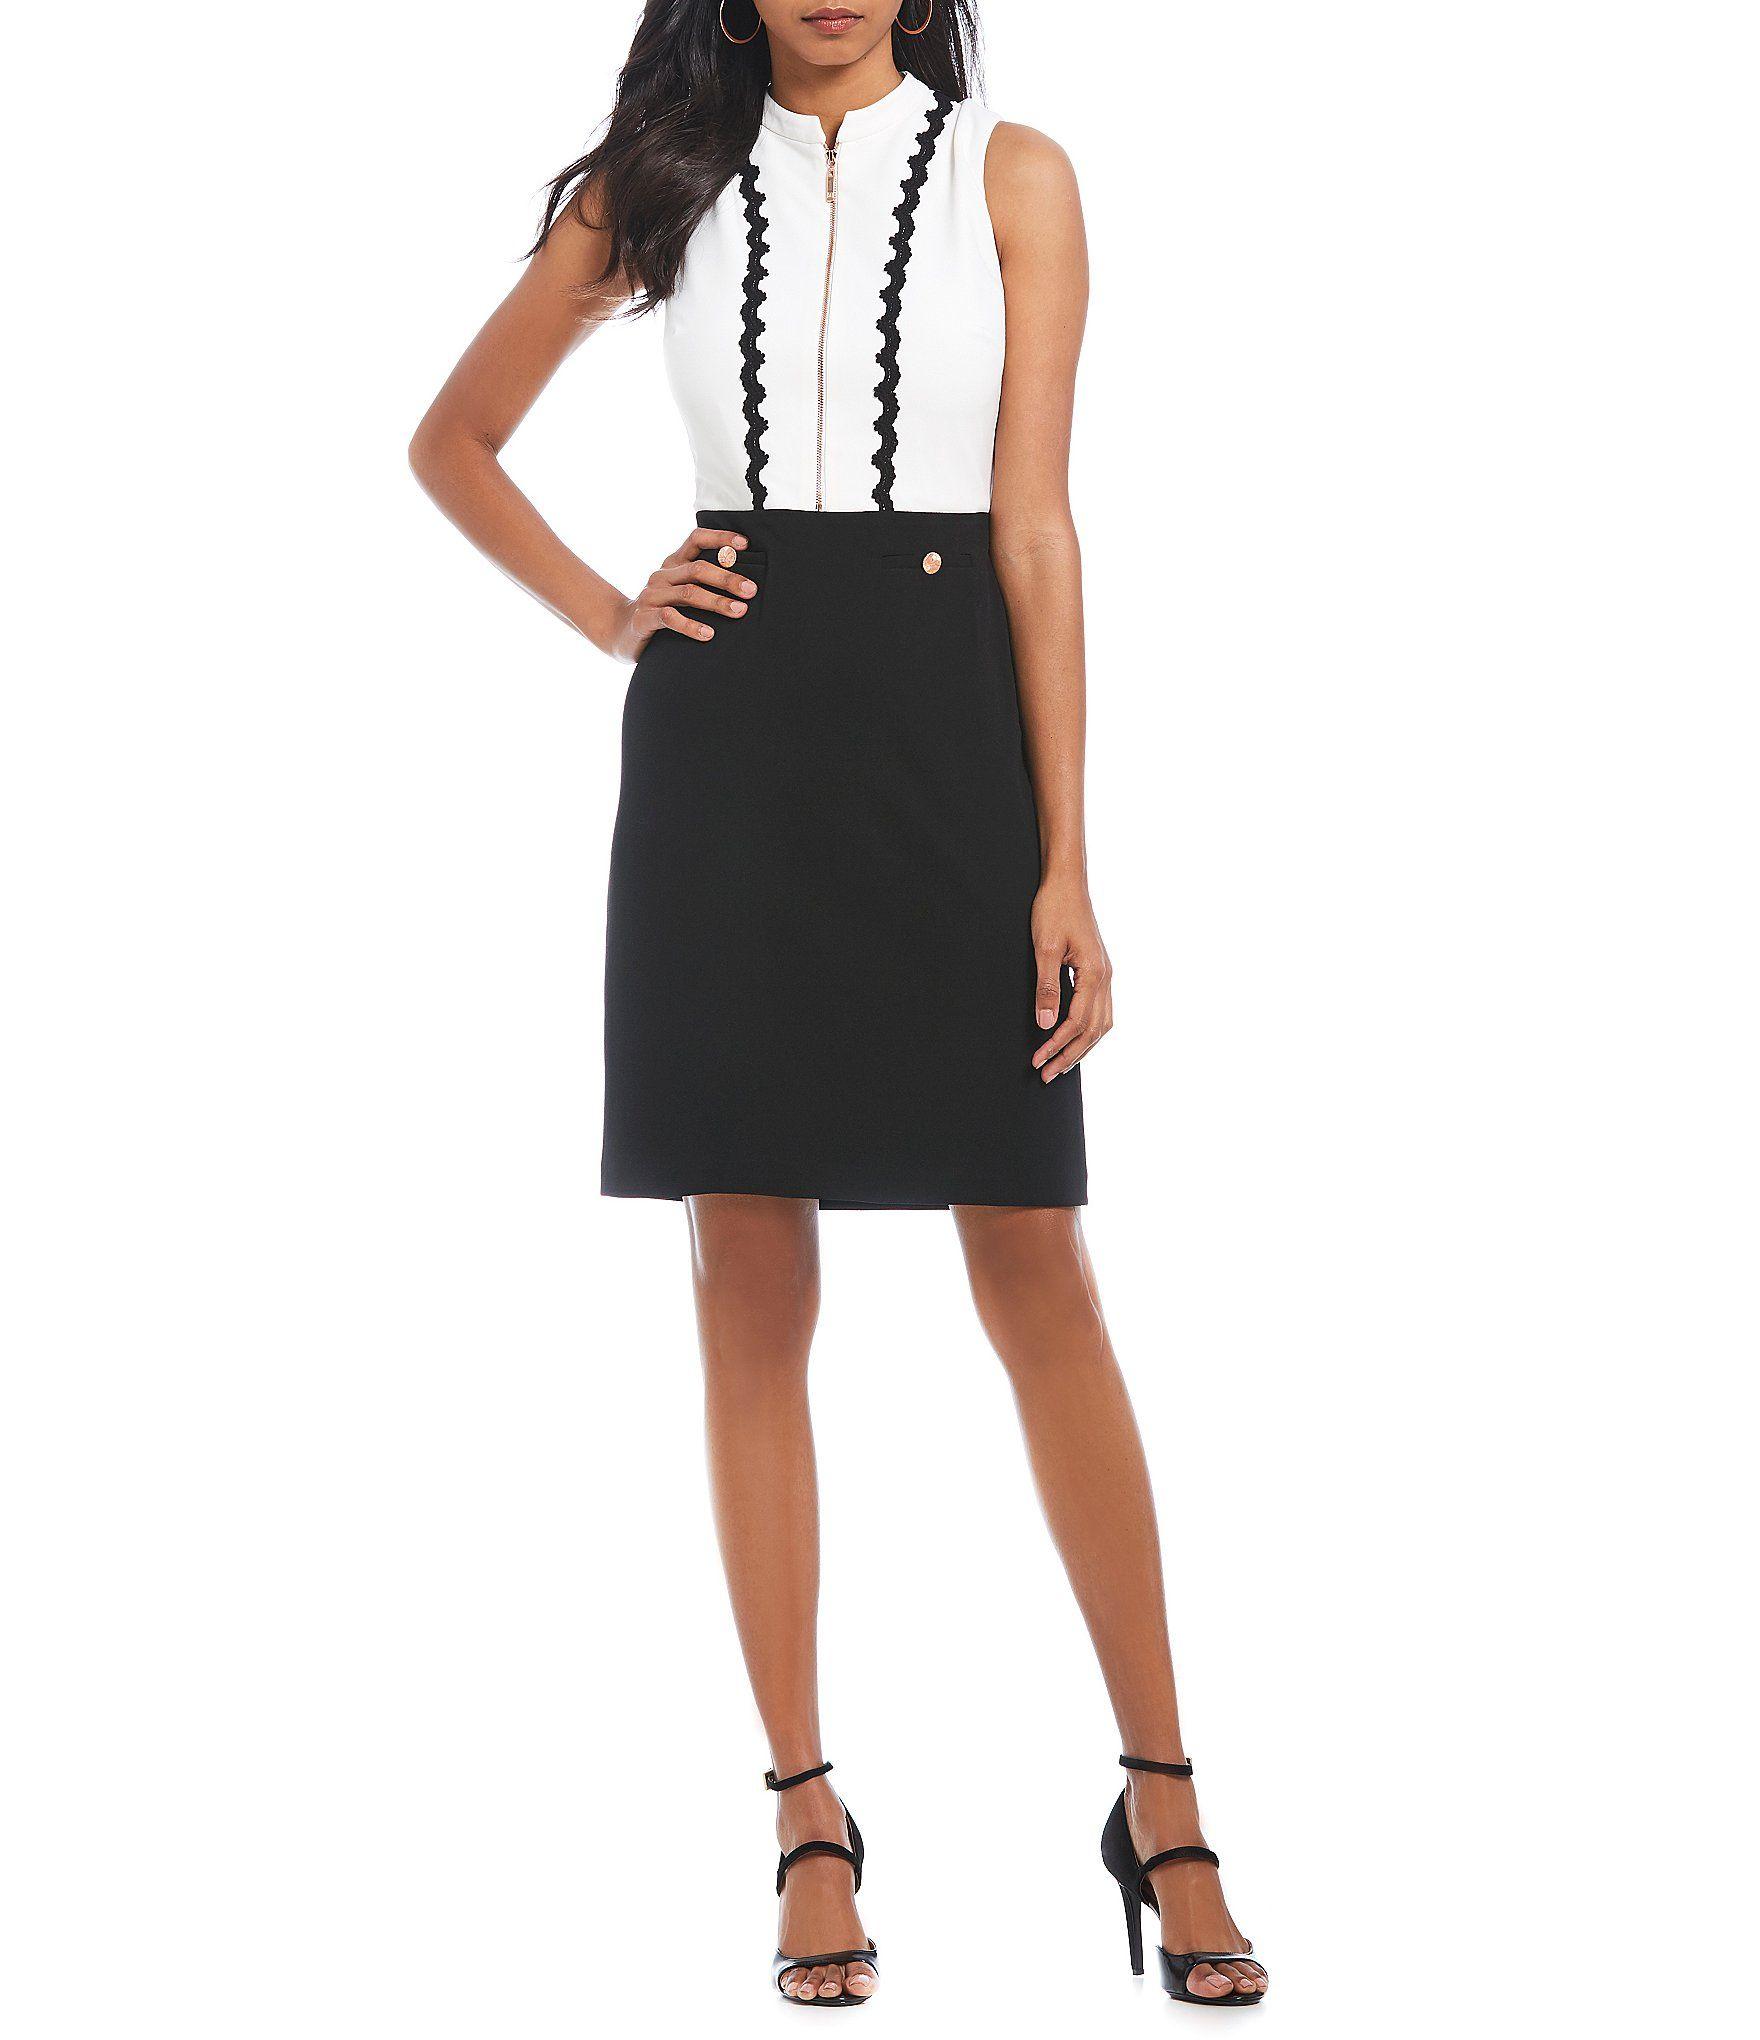 6f53ef50436 Shop for Ivanka Trump Zip Front Mandarin Collar Scalloped Lace Trim Sheath  Dress at Dillards.com. Visit Dillards.com to find clothing